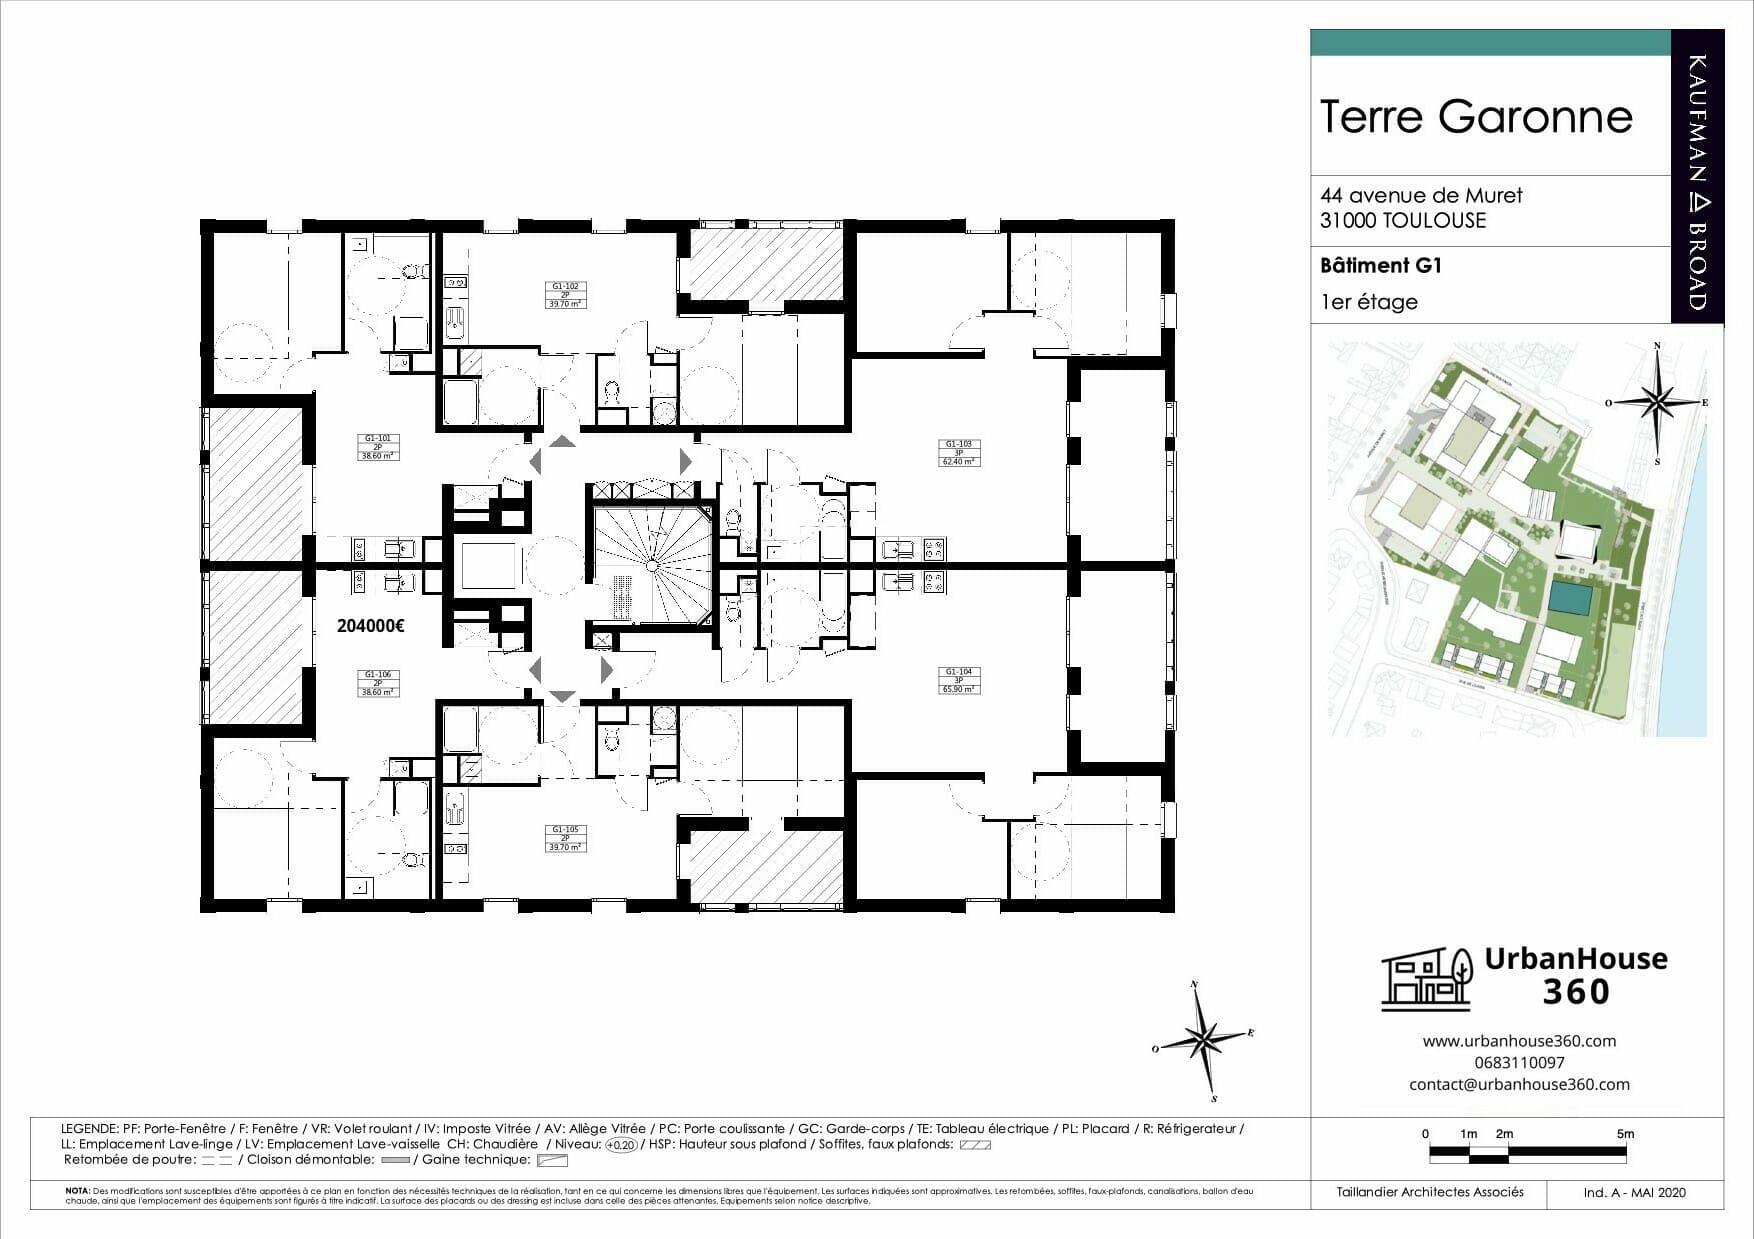 Urbanhouse360-Kaufman-Broad-Terre-Garonne_G1-R+1_2D 2